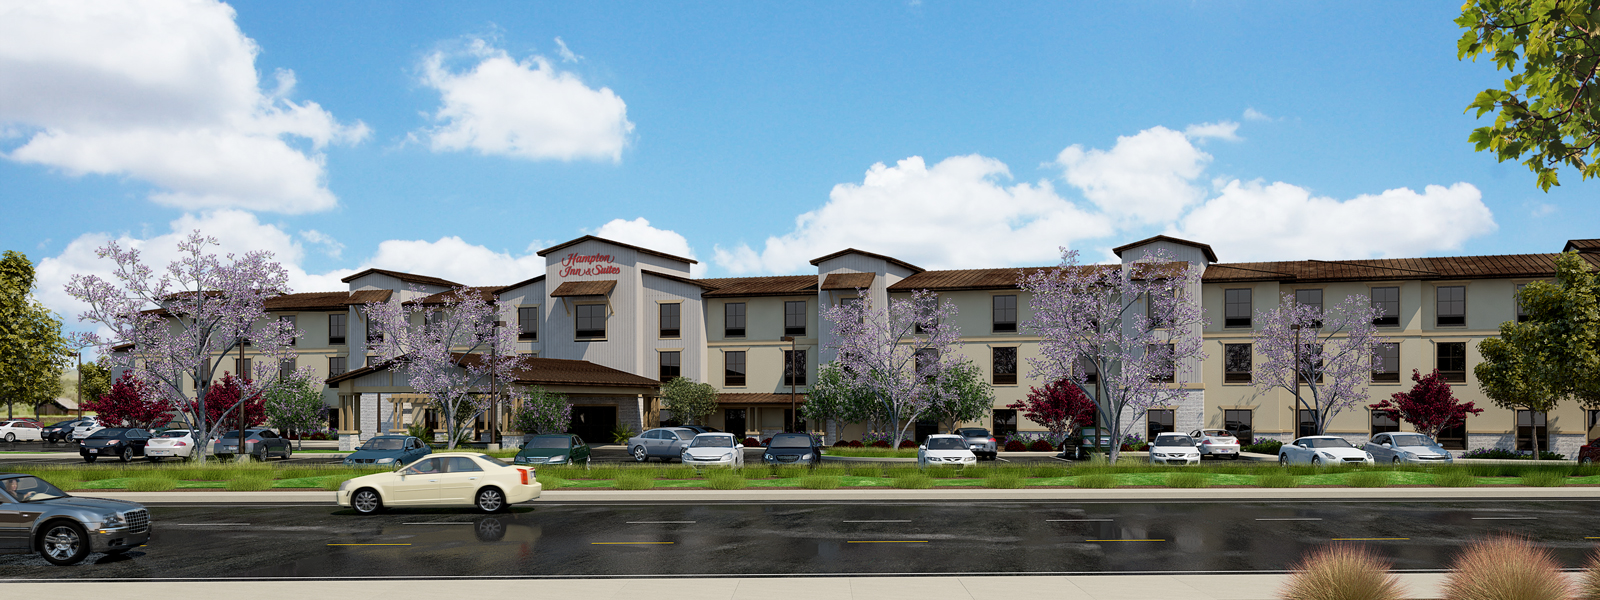 Hampton Inn - Buellton, CA